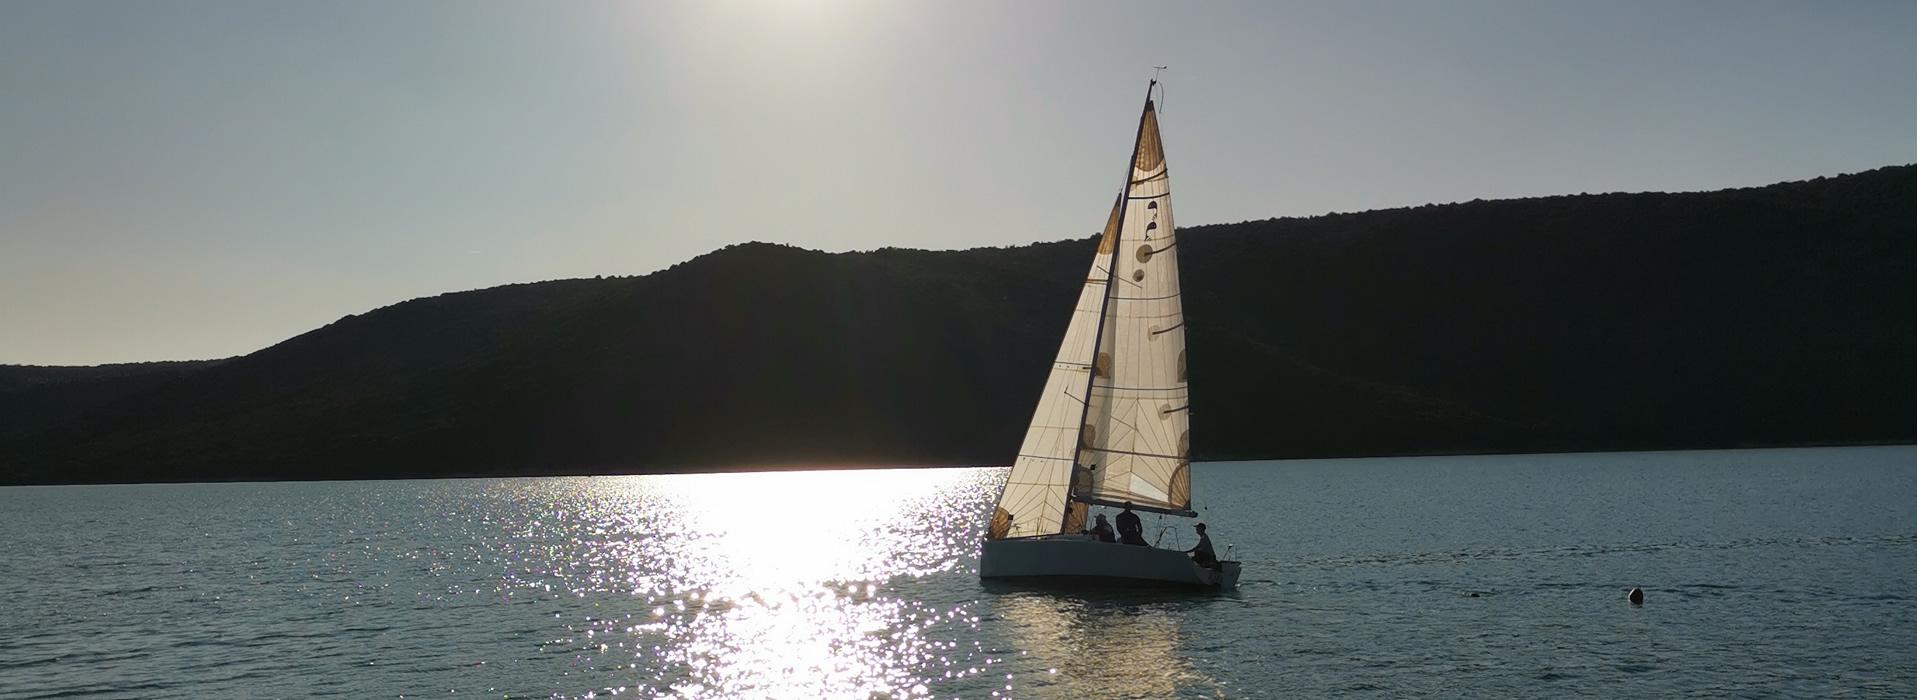 Sailing School Croatia Learn How To Sail Courses Sailing 360